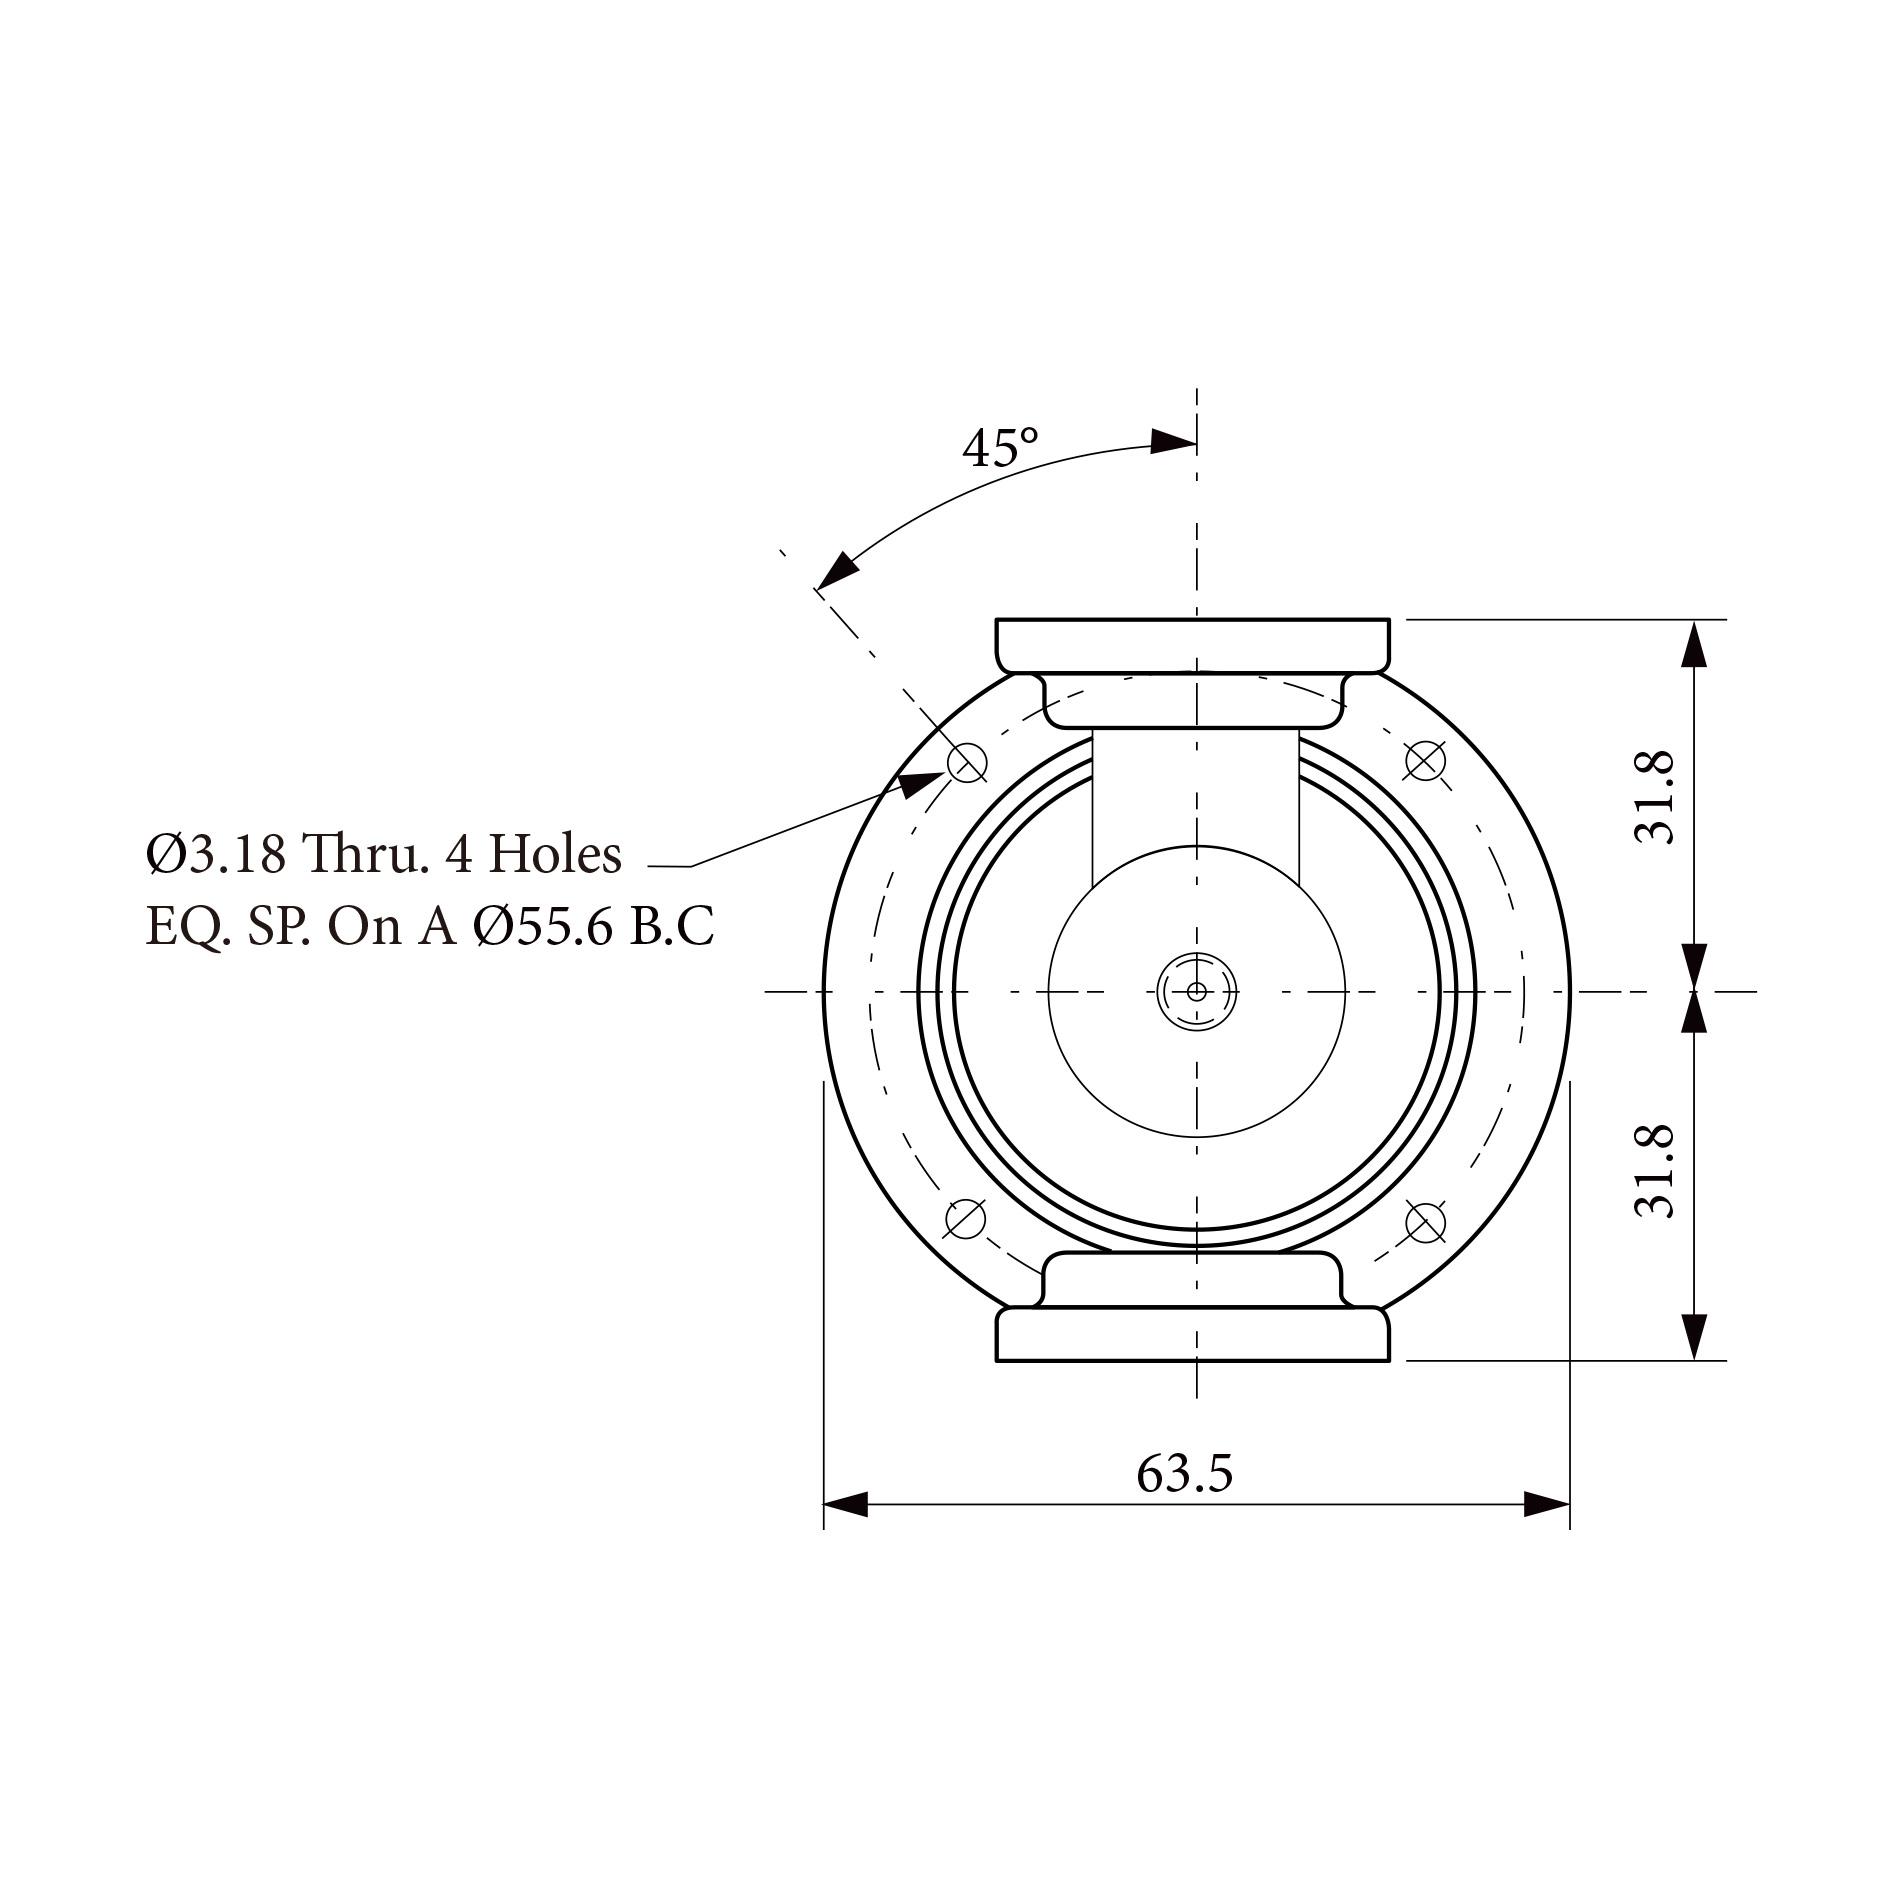 三路旋转关节RJ153187 1CH  2CH 3CH均为5.4 ~5.9 GHz  WR 187 Flange